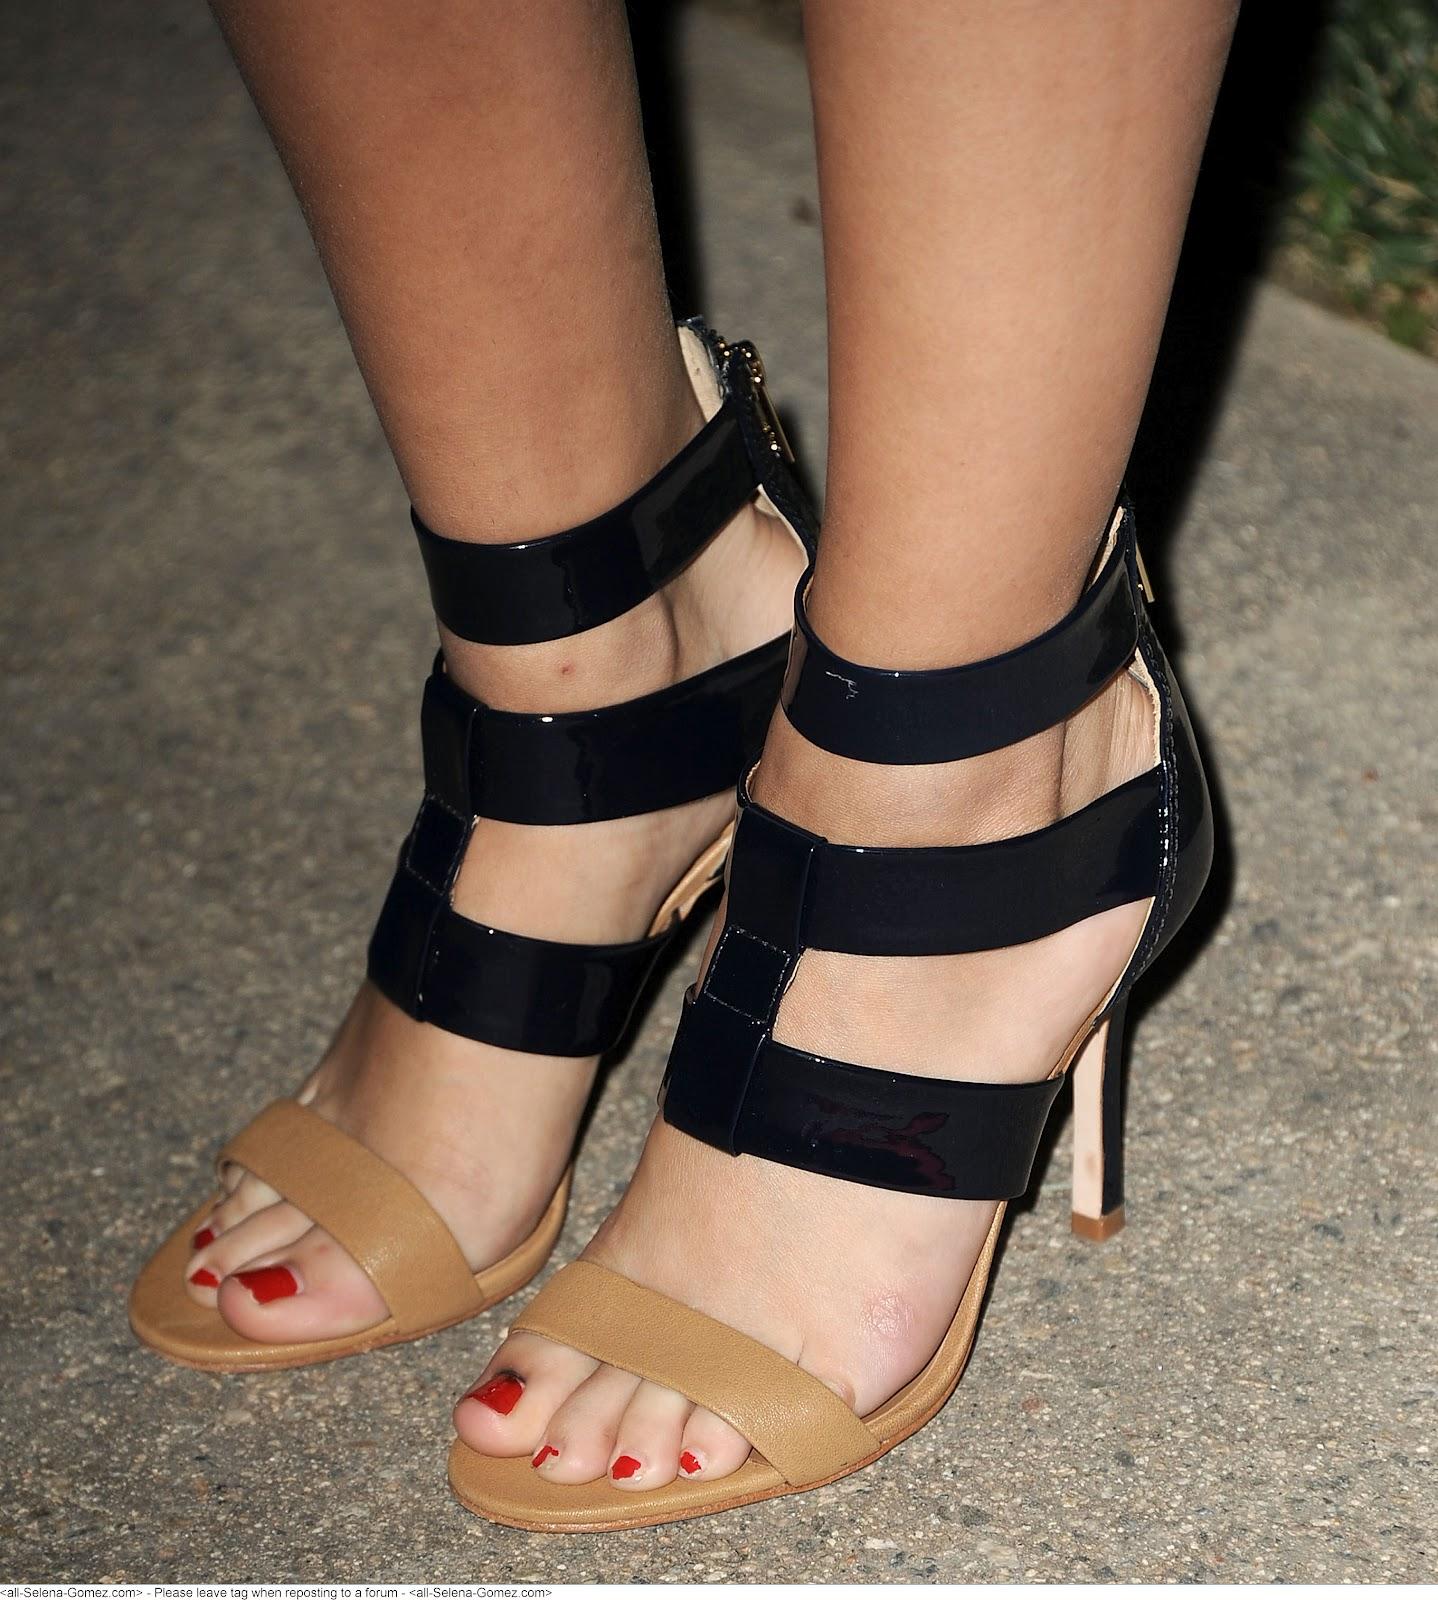 Selena Gomez Foot Fetish